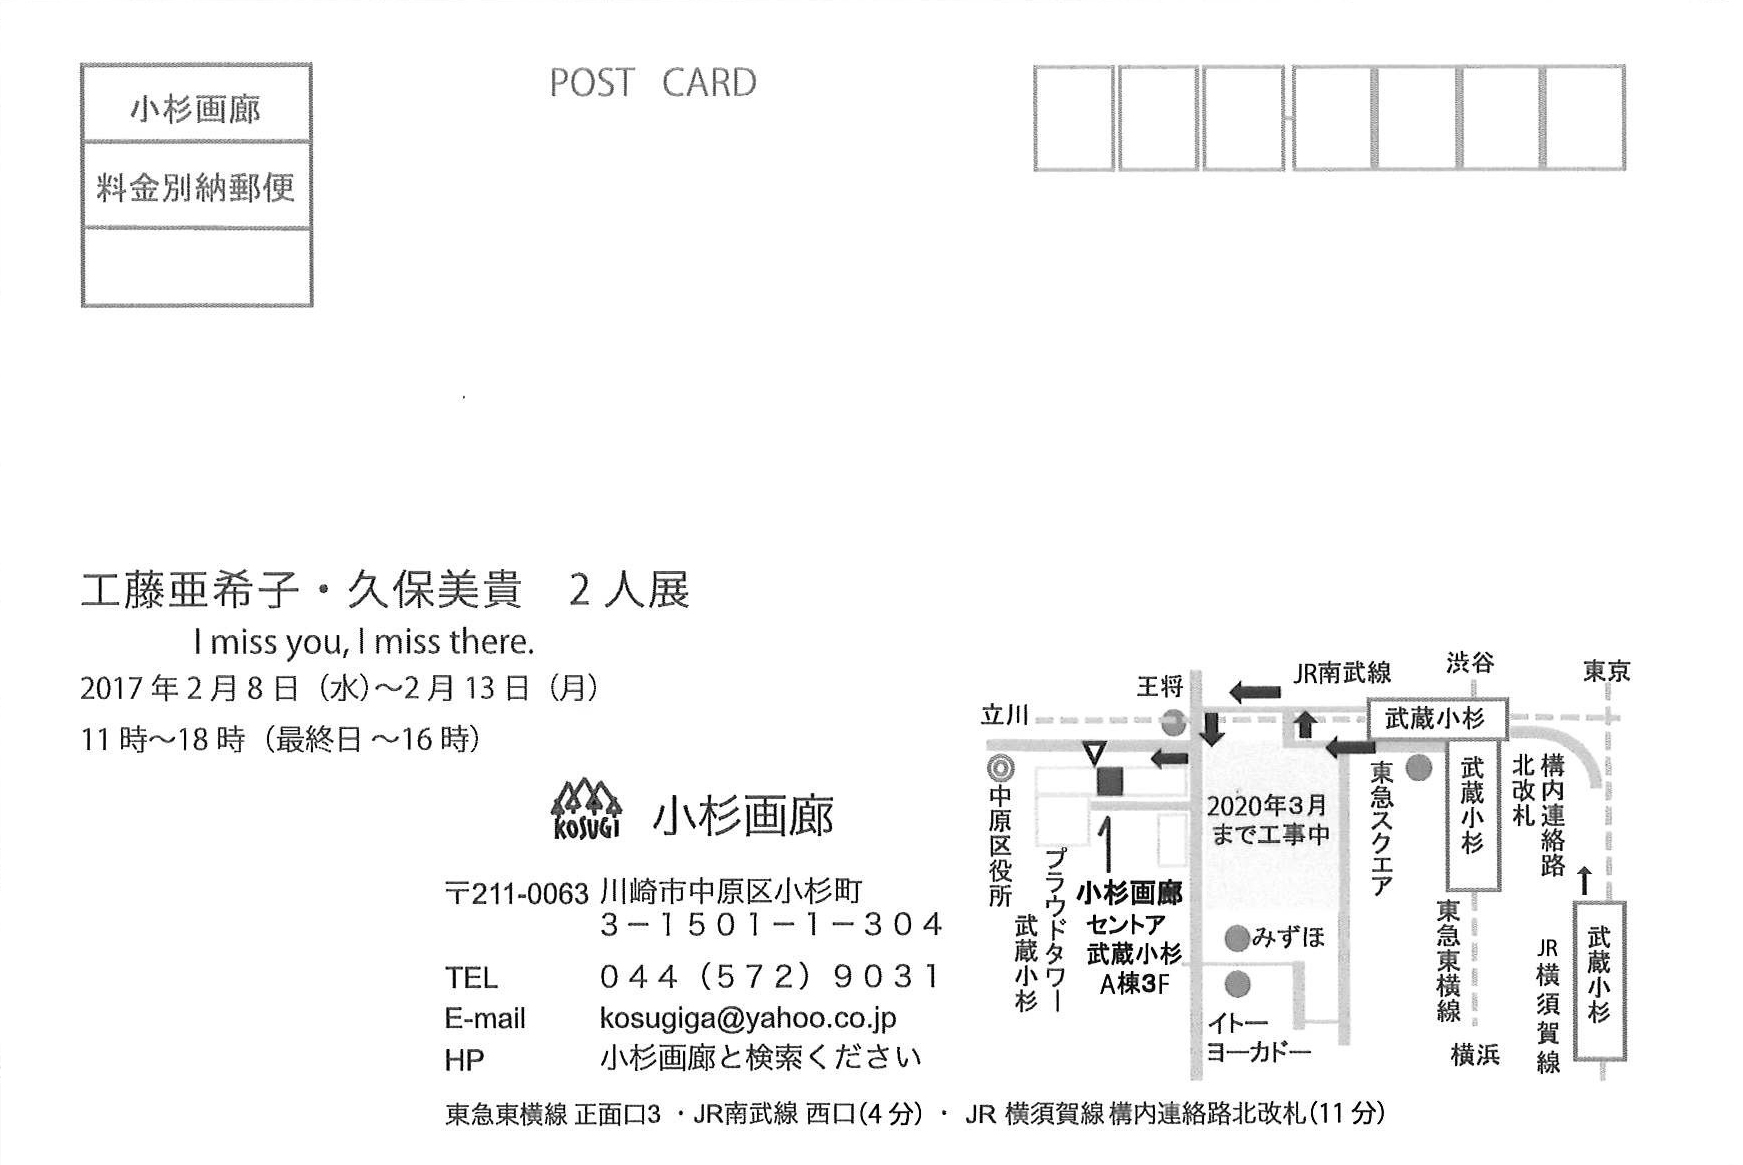 20170203104440_00001